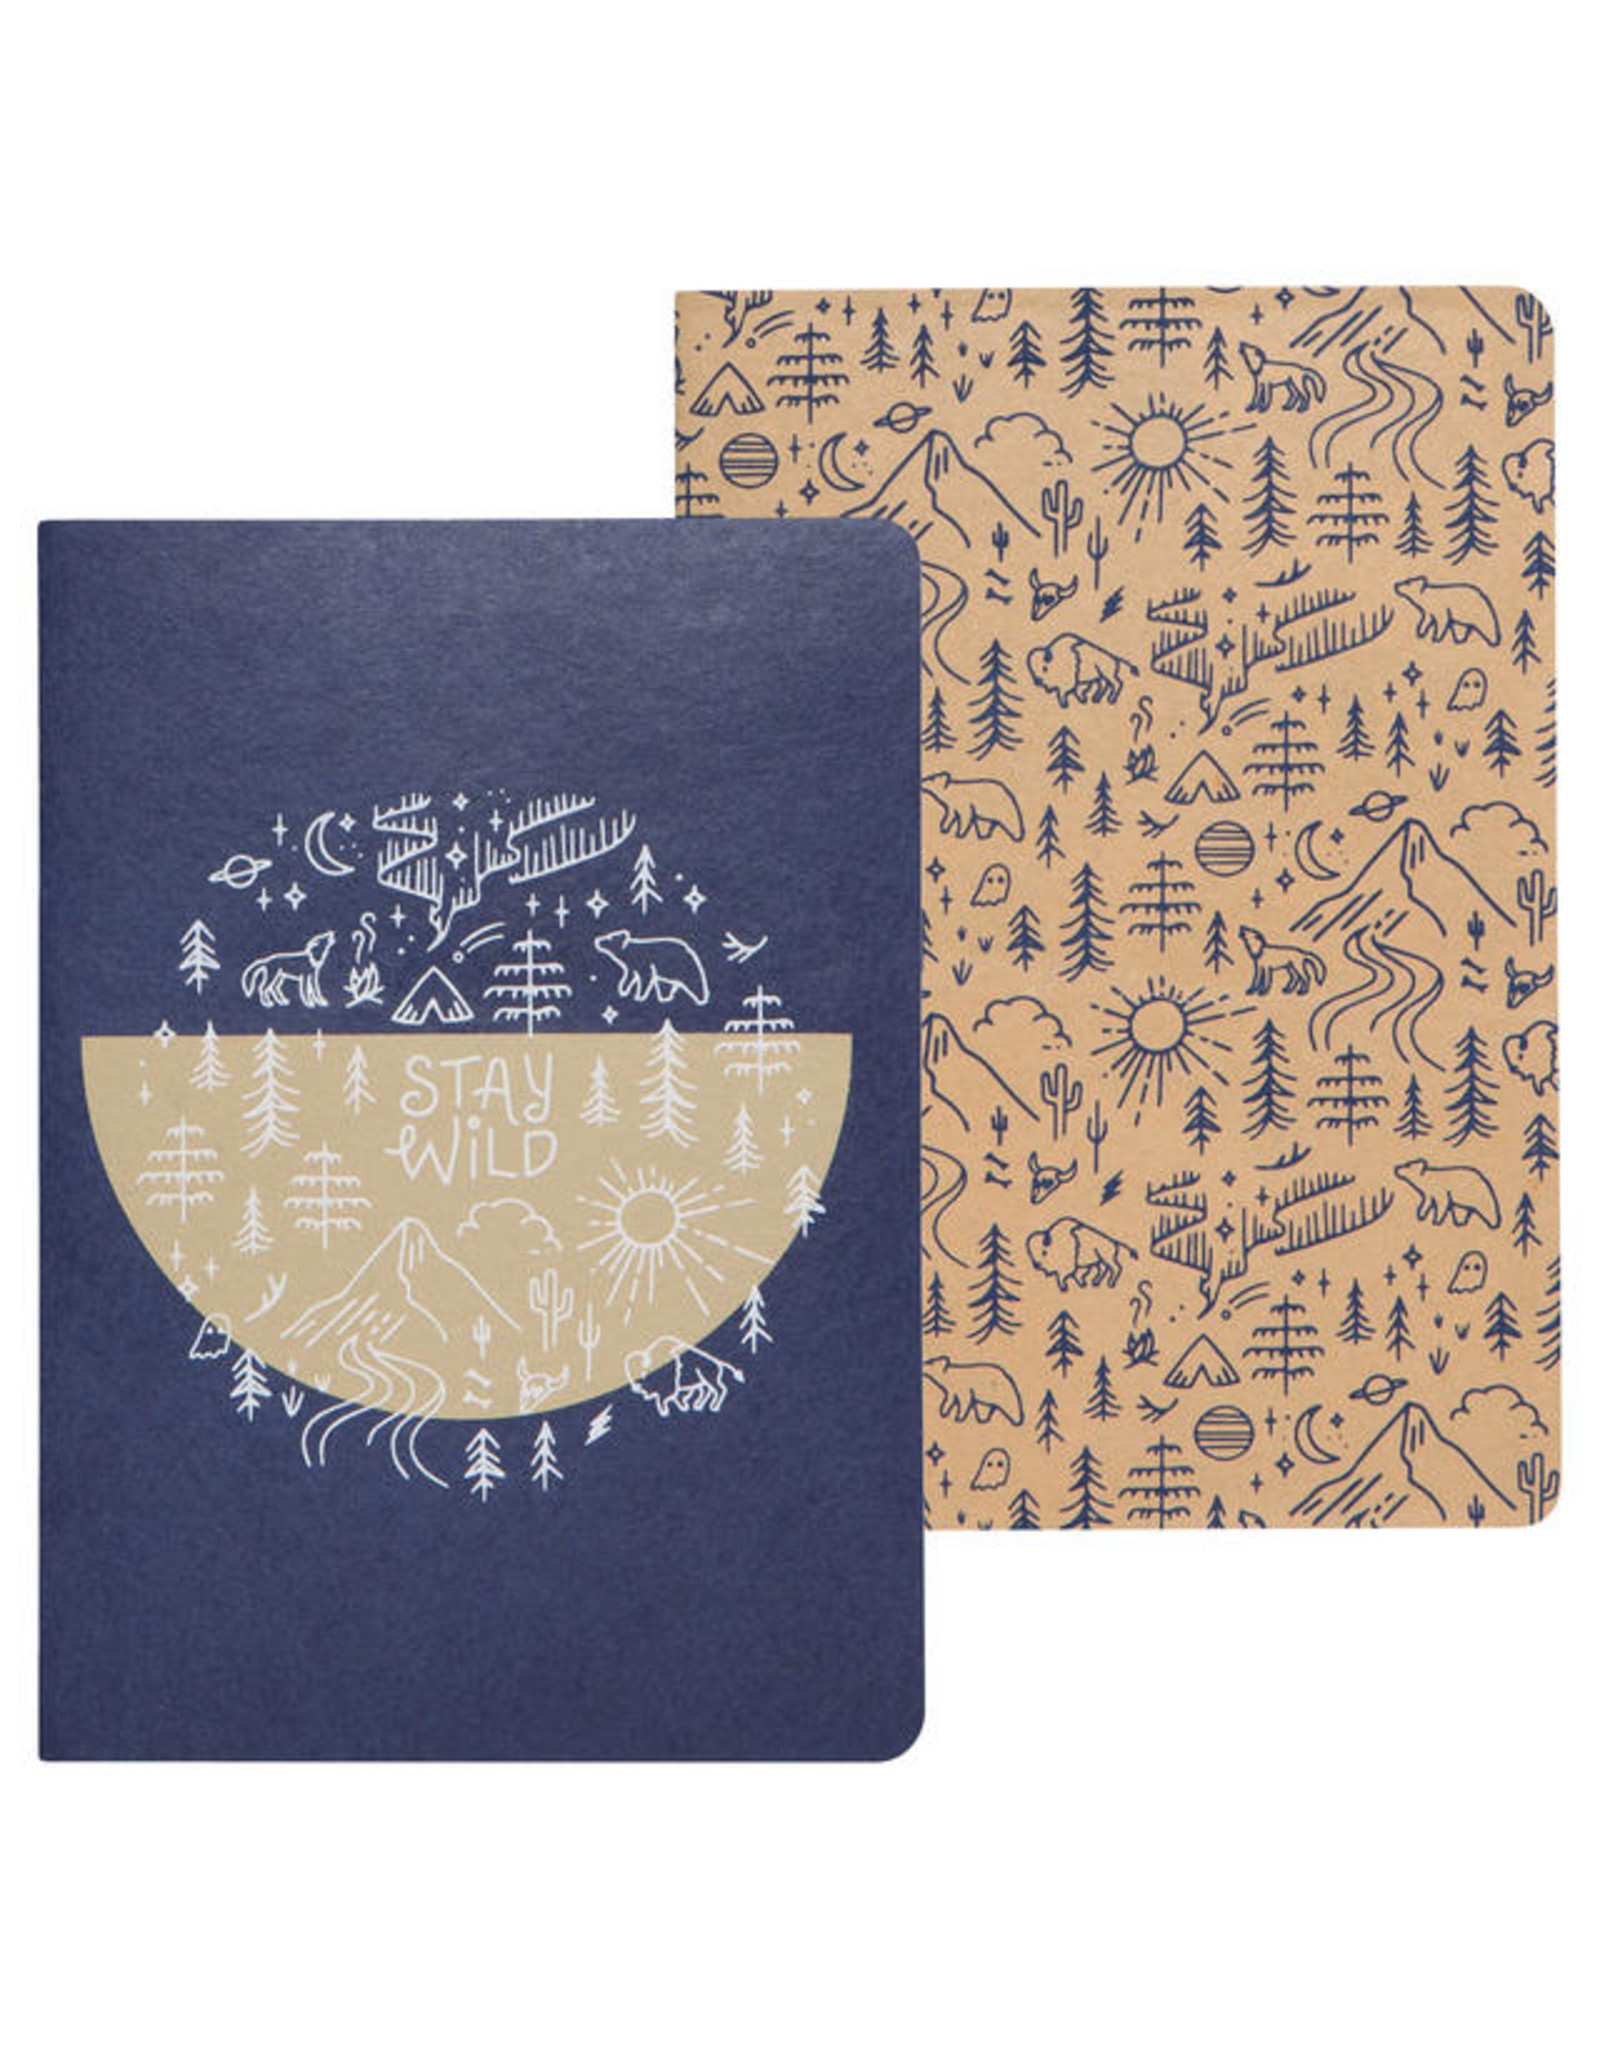 Stay Wild Notebook Set/2